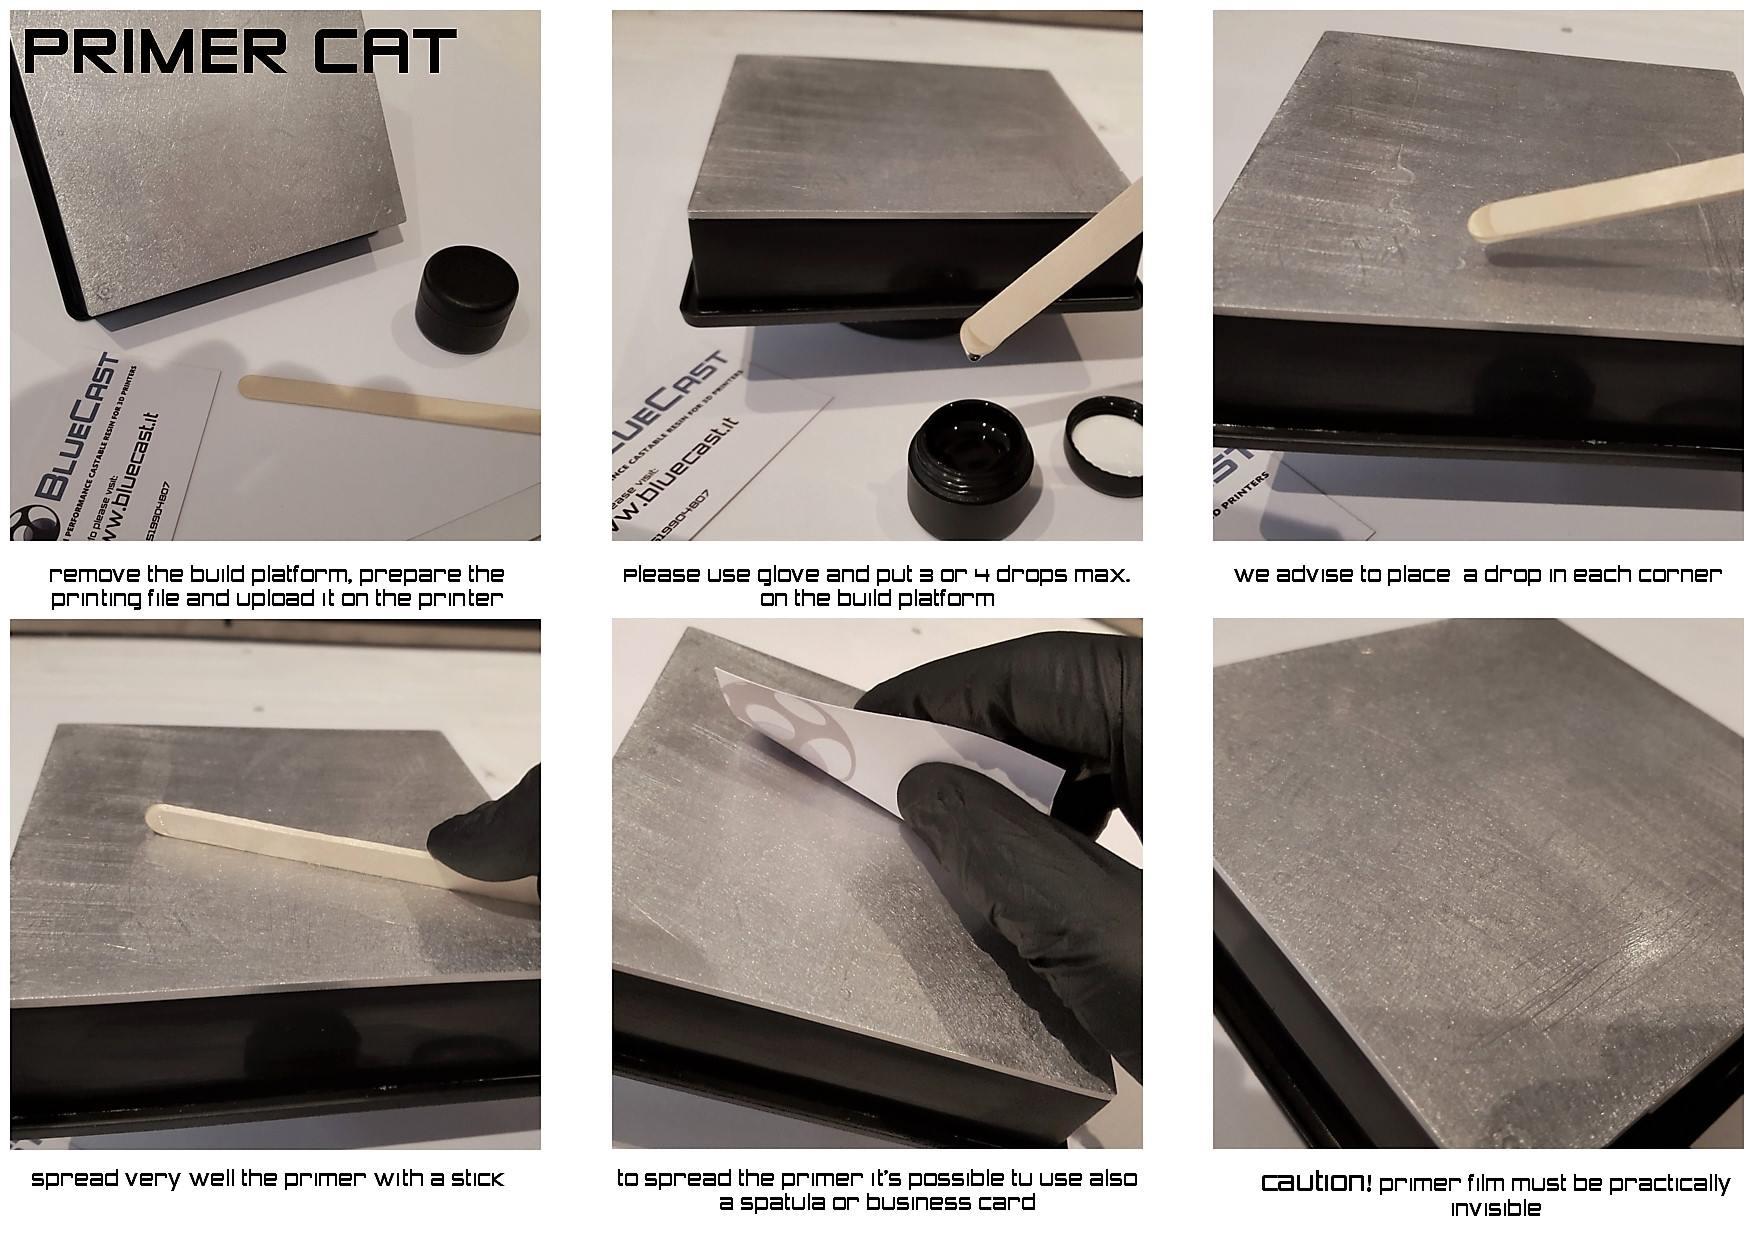 BlueCast Primercat usage instructions